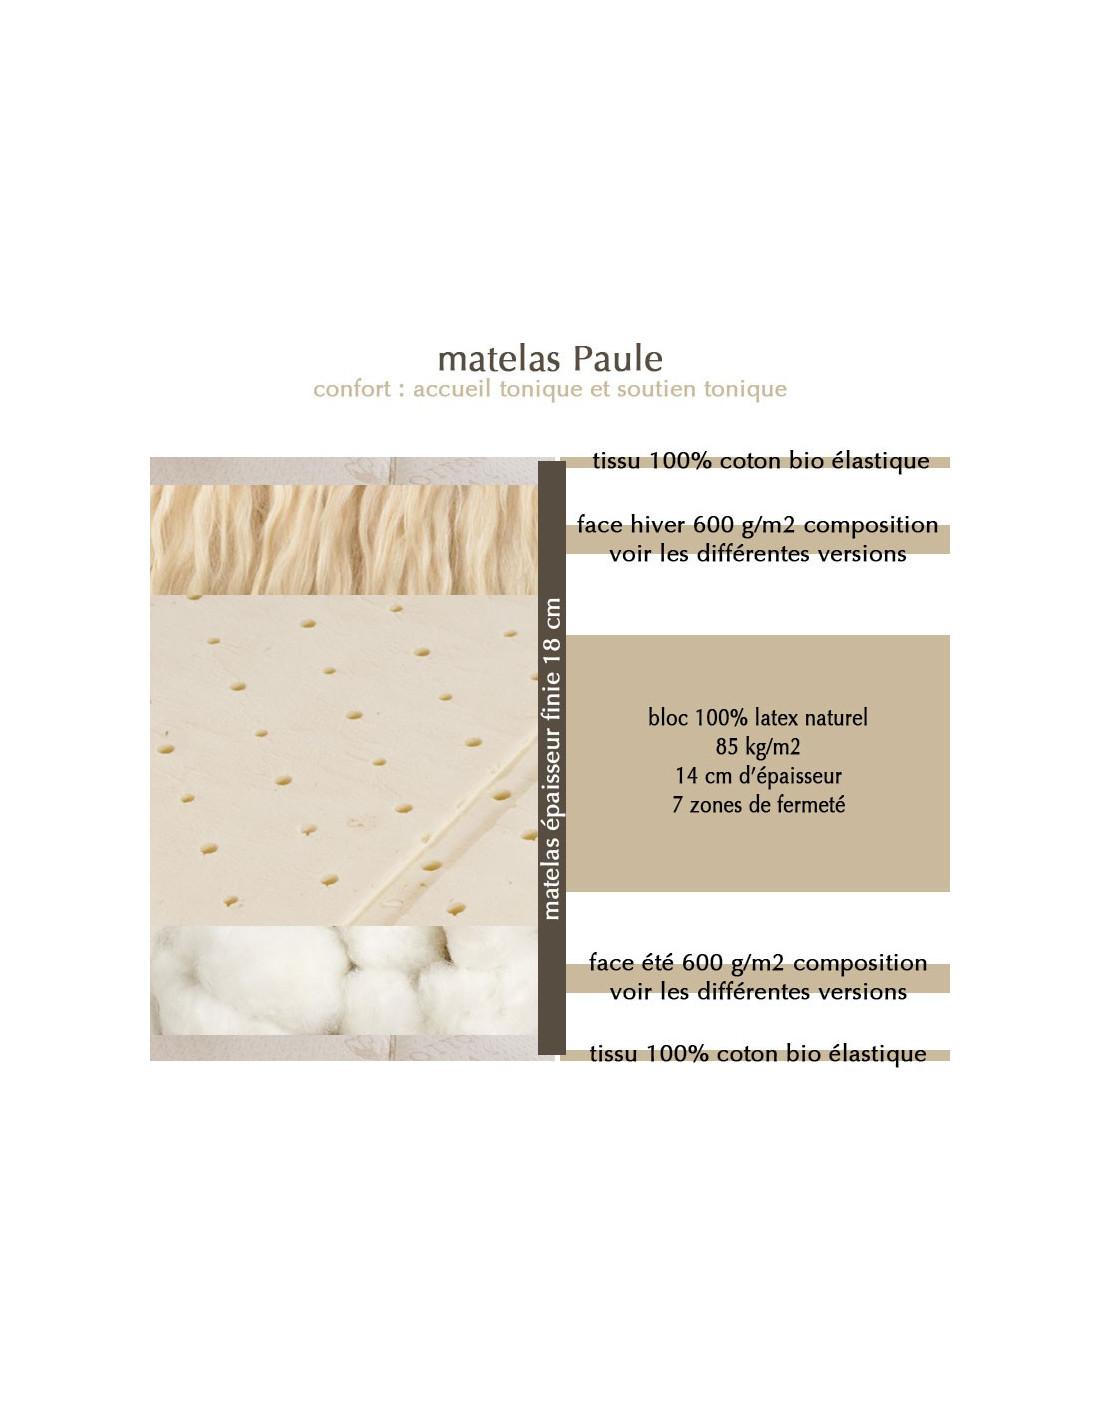 matelas enfant paule latex naturel noctea. Black Bedroom Furniture Sets. Home Design Ideas